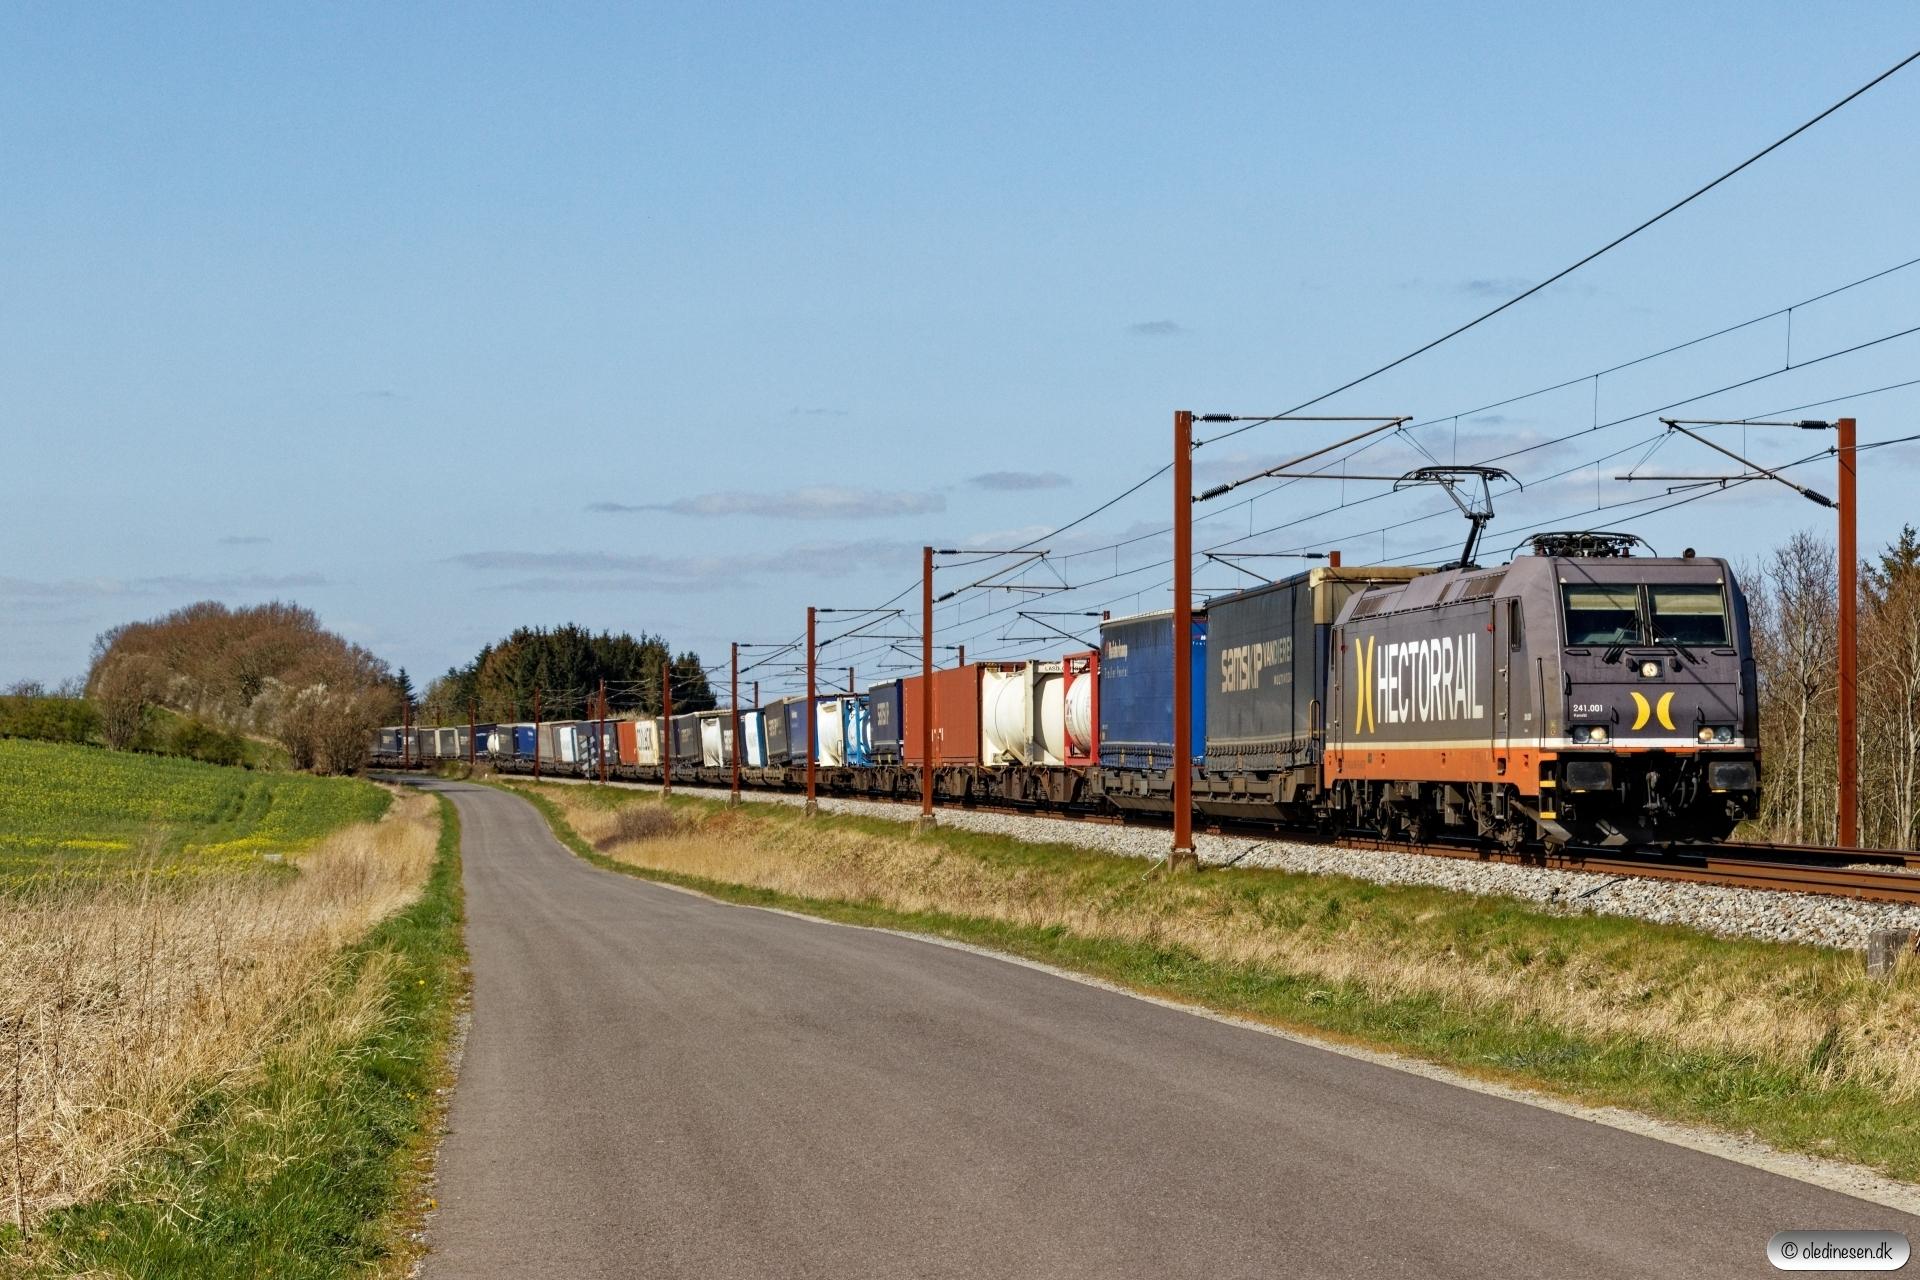 HCTOR 241.001 med HS 41040 Pa-Mgb. Km 195,4 Kh (Ejby-Nørre Åby) 16.04.2020.